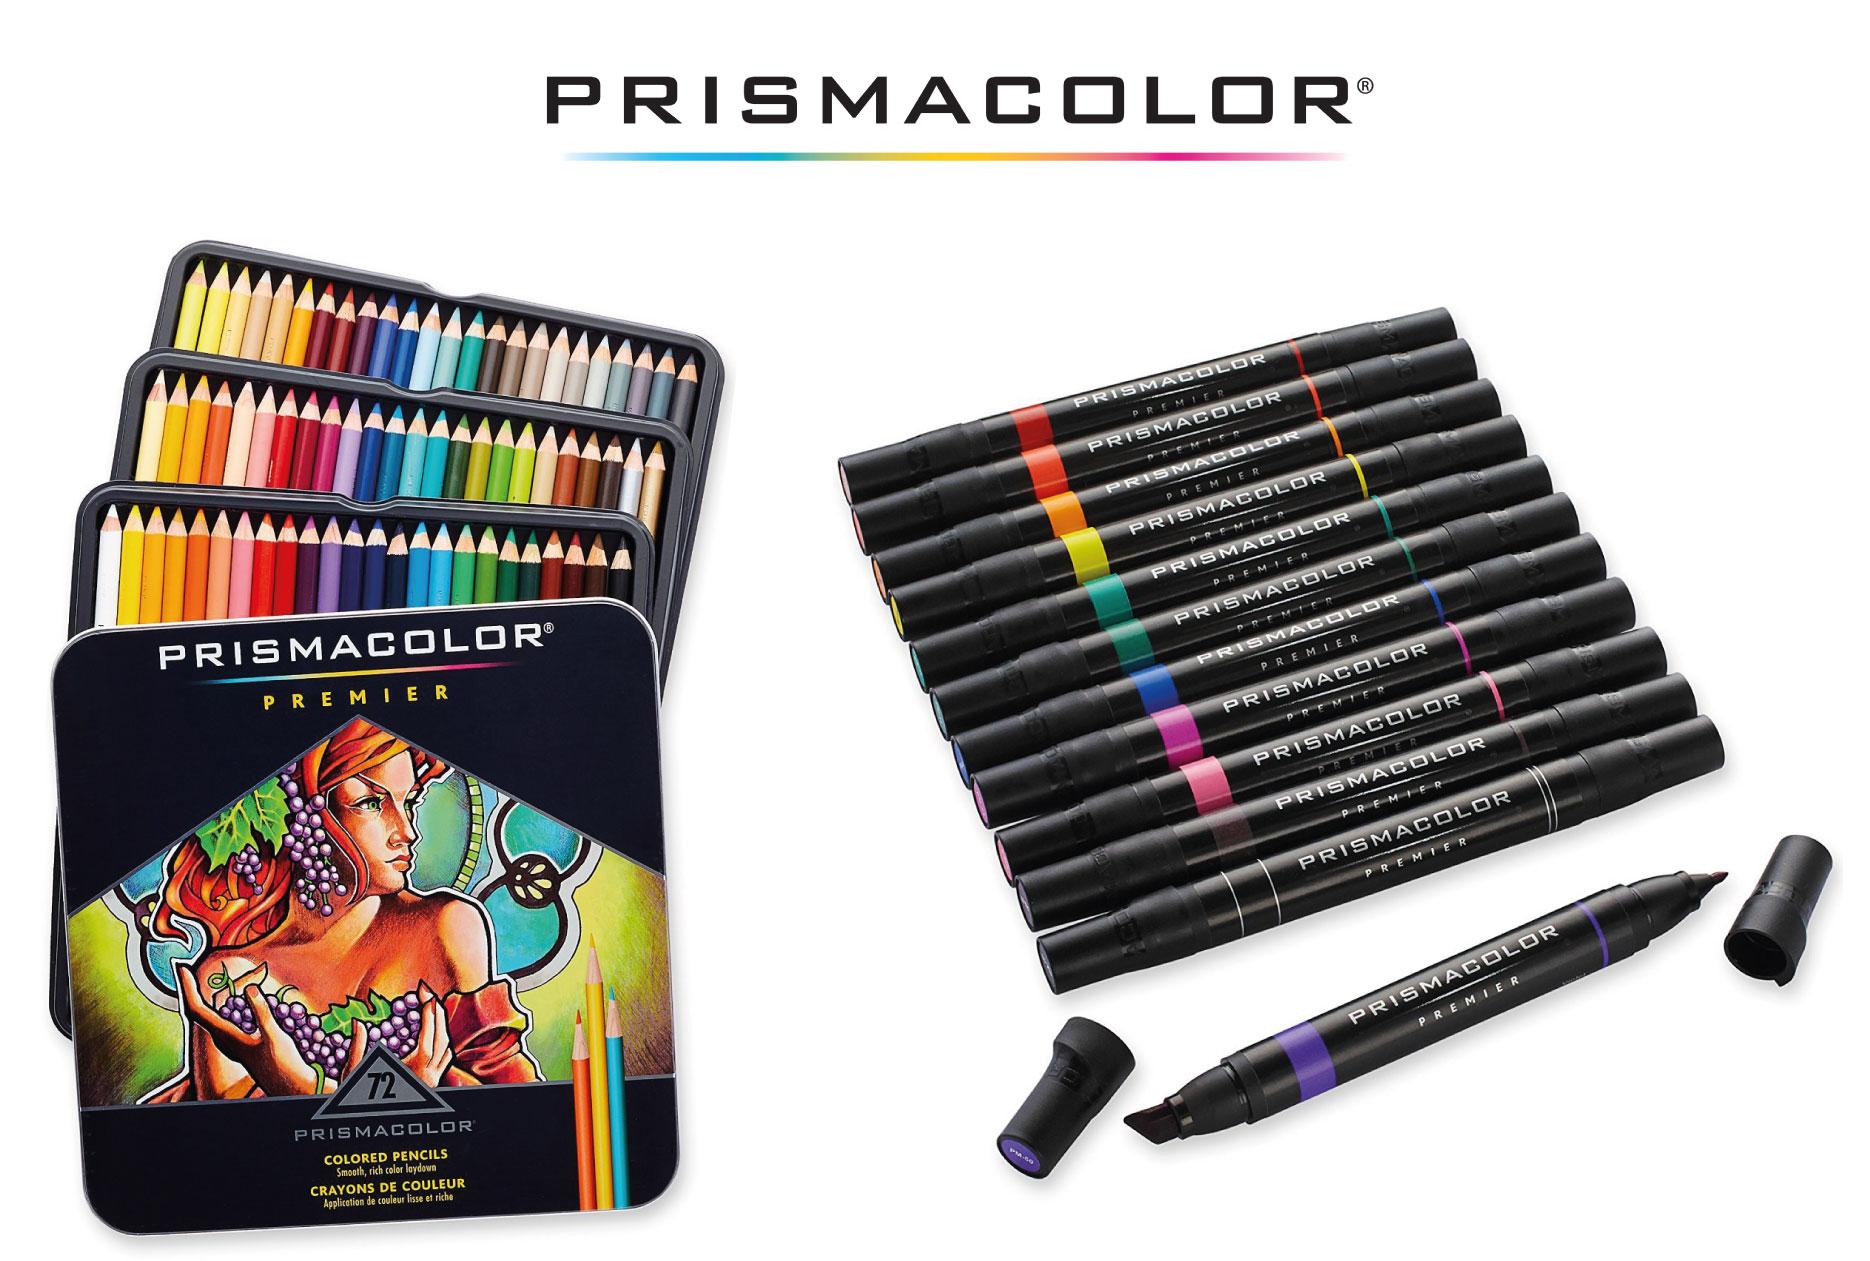 redefining prismacolor s brand language future roadmap product